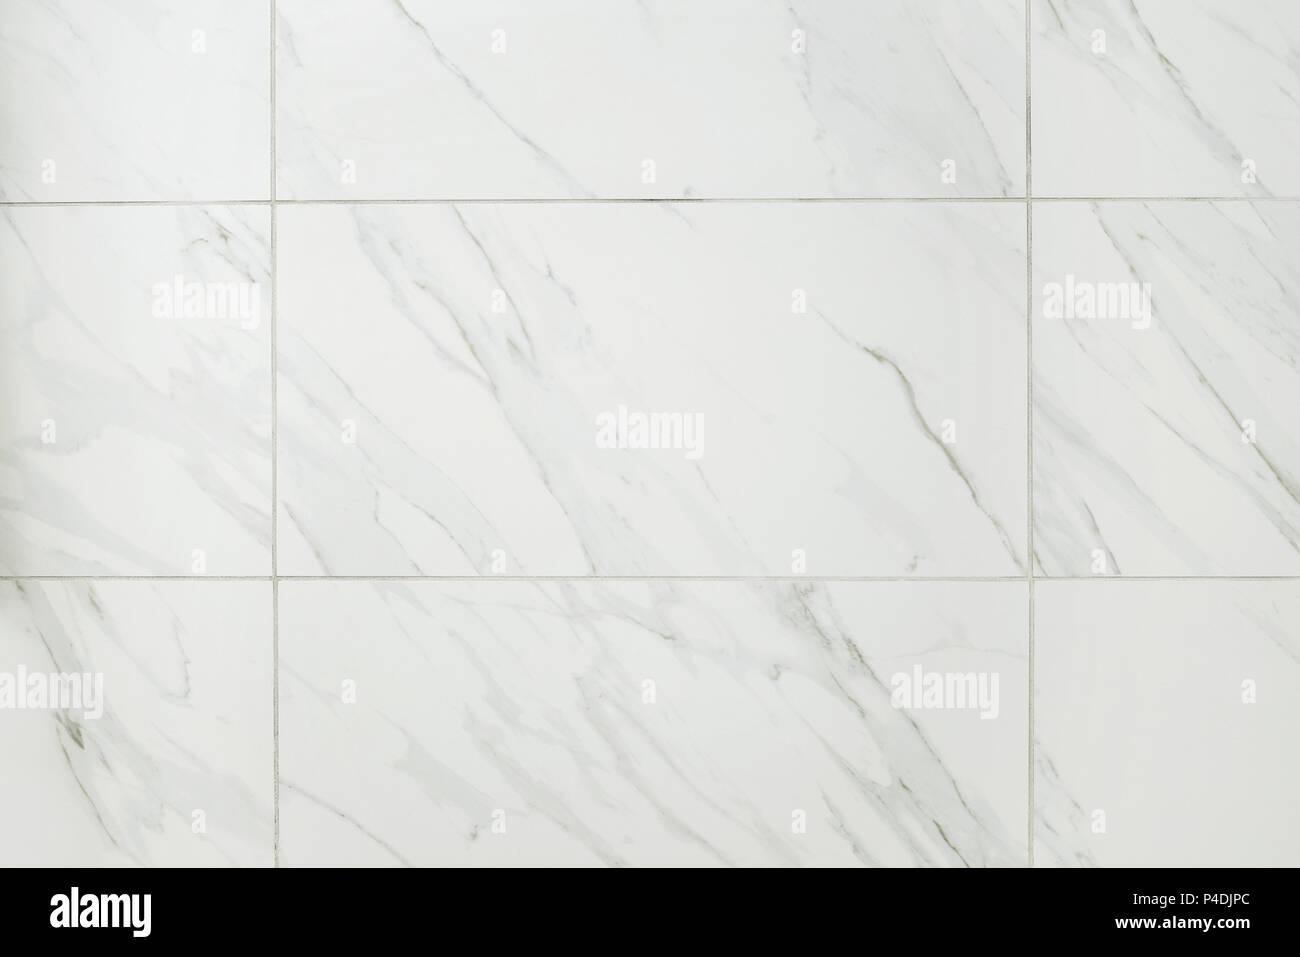 Große Marmor Fliesen Badezimmer Wand Stockfoto, Bild ...